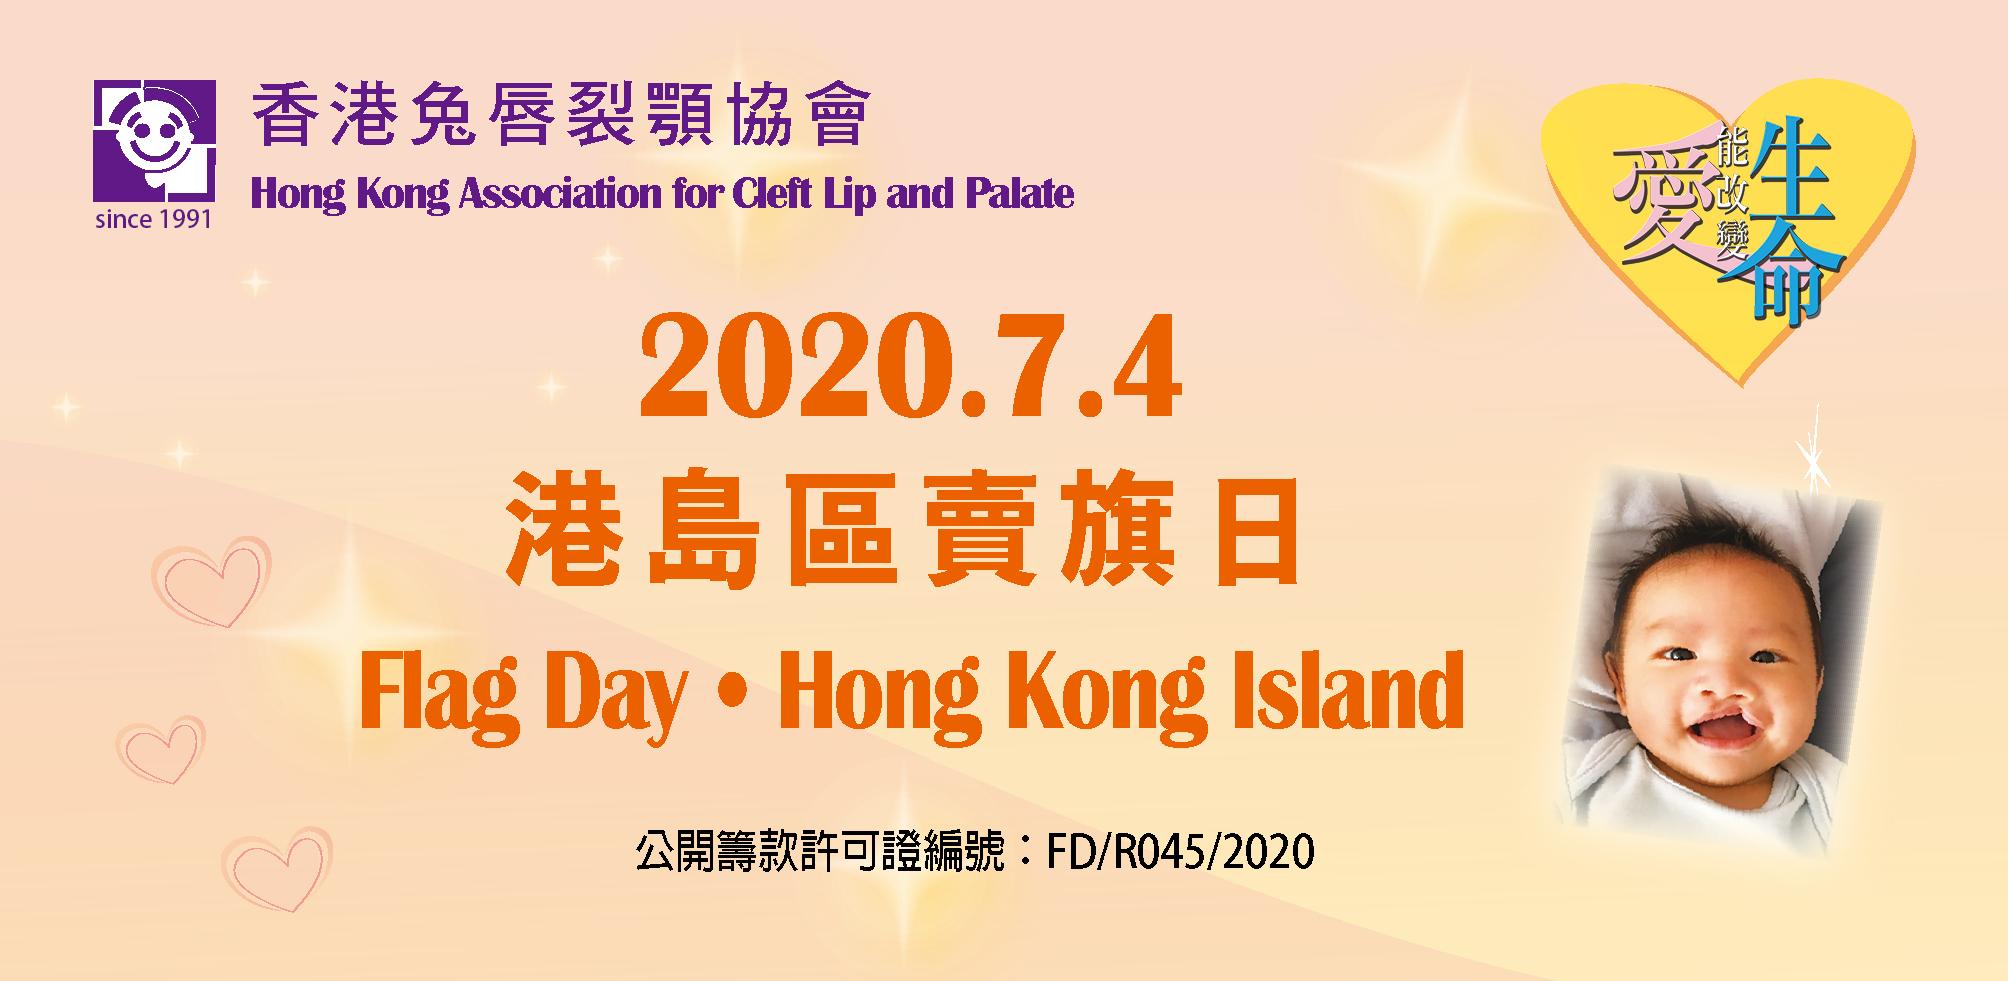 https://www.cleftlip.org.hk/wp-content/uploads/2020/06/2020_FlagDayBanner_desktop.jpg